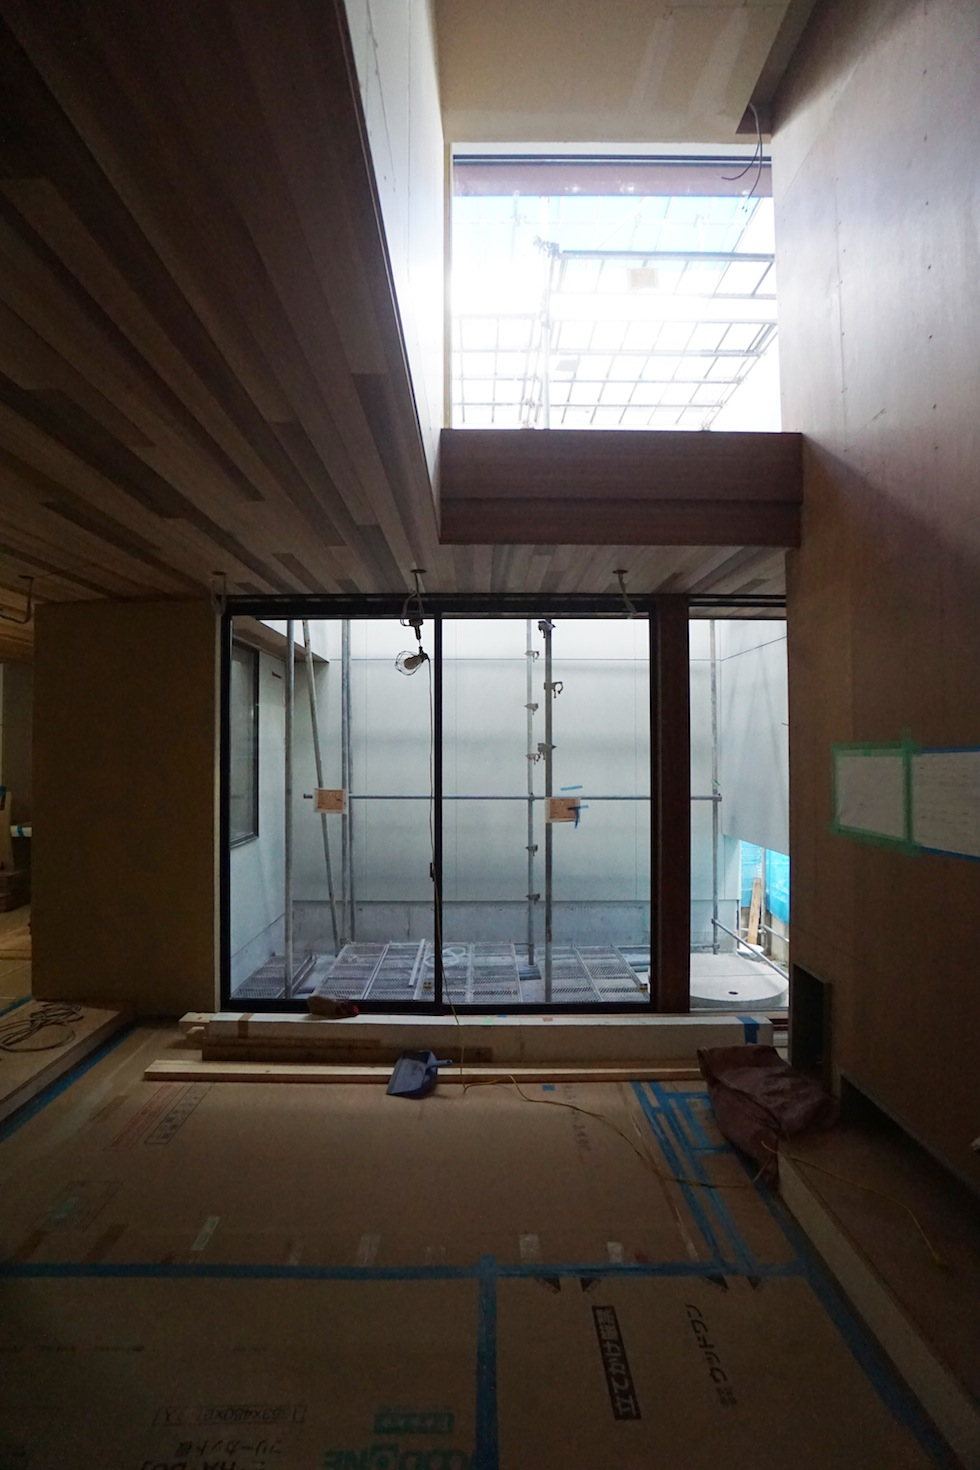 建築家,大阪,北摂,豊中,吹抜,光,コートハウス,中庭,